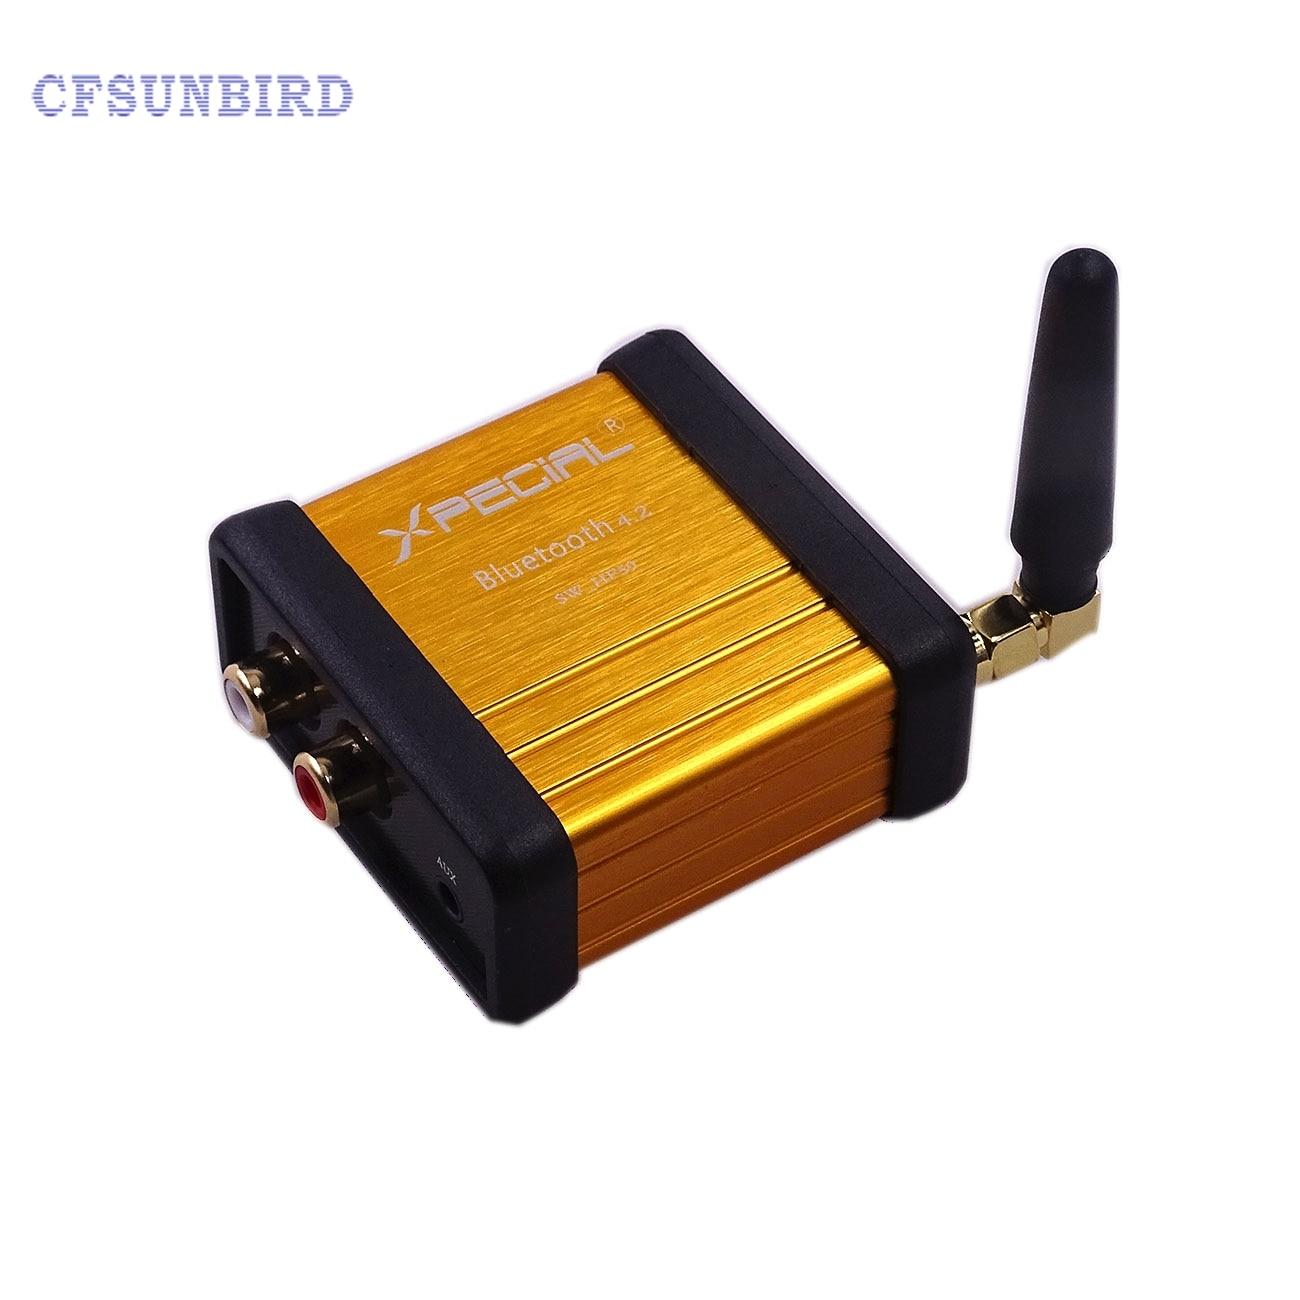 HIFI Bluetooth 4.2 Stereo Audio Receiver Box CSR64215 Digital Amplifier Board -R179 Drop Shipping радиоприемник 25 hifi 25w